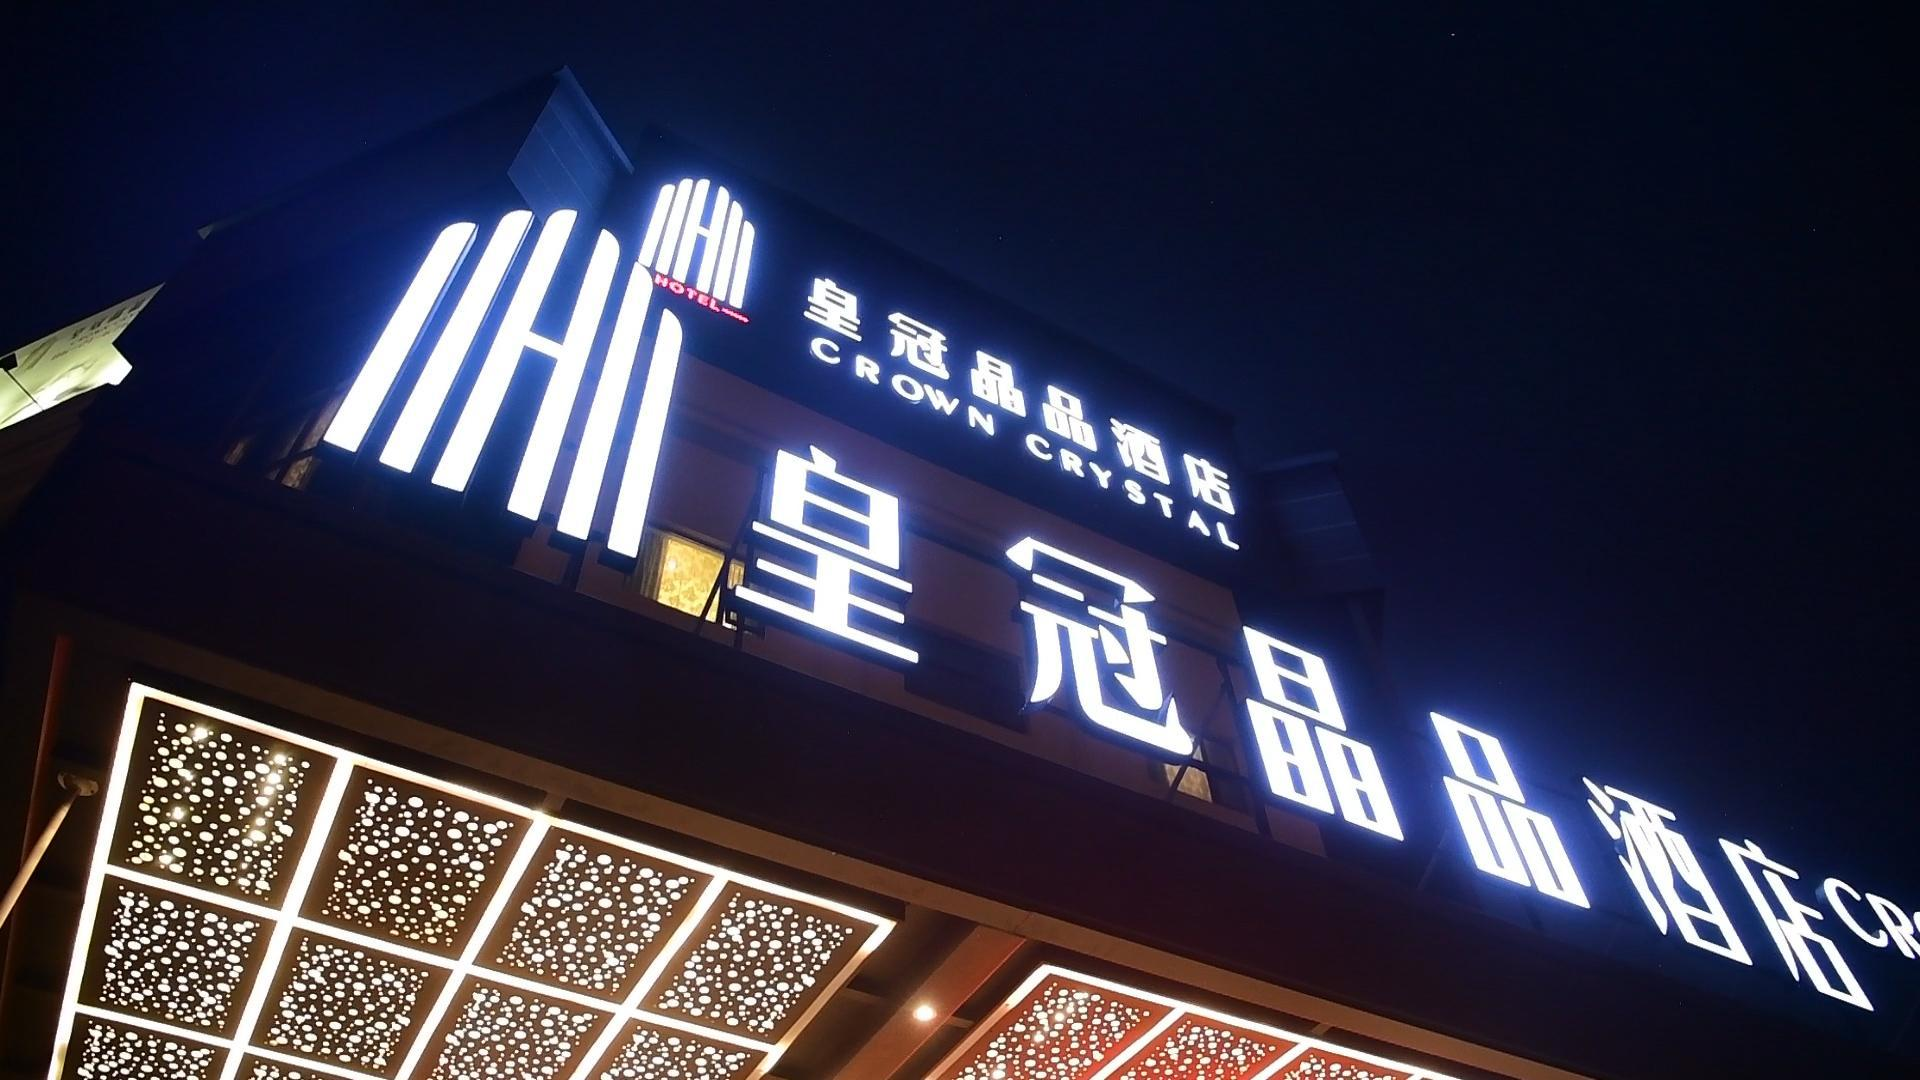 Shanghai Crown Crystal Hotel